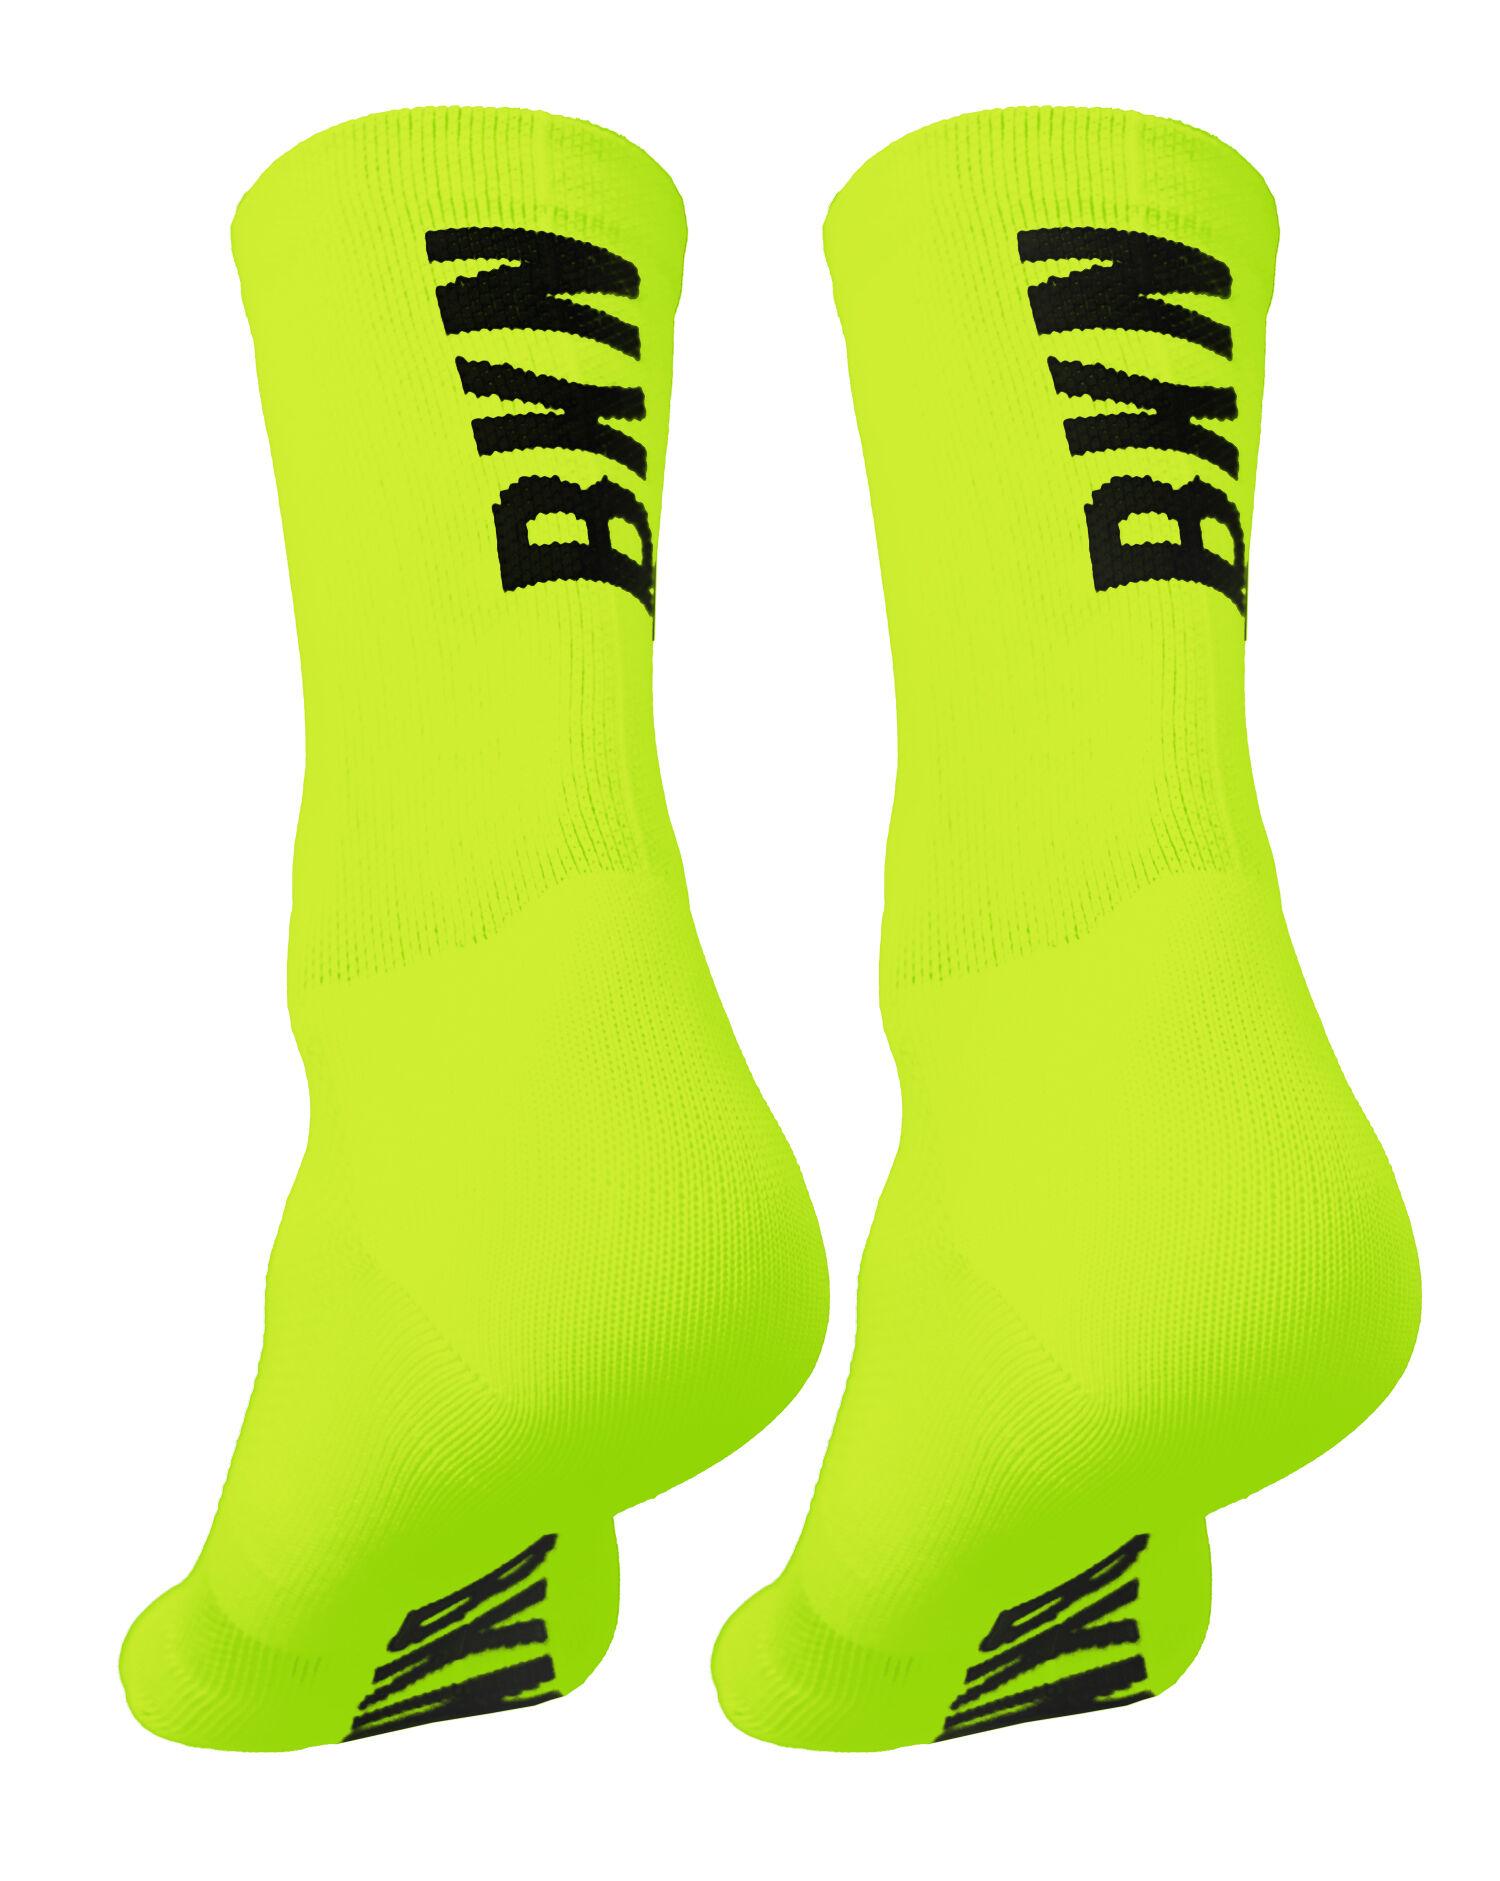 BKN Solid Fluro Socks